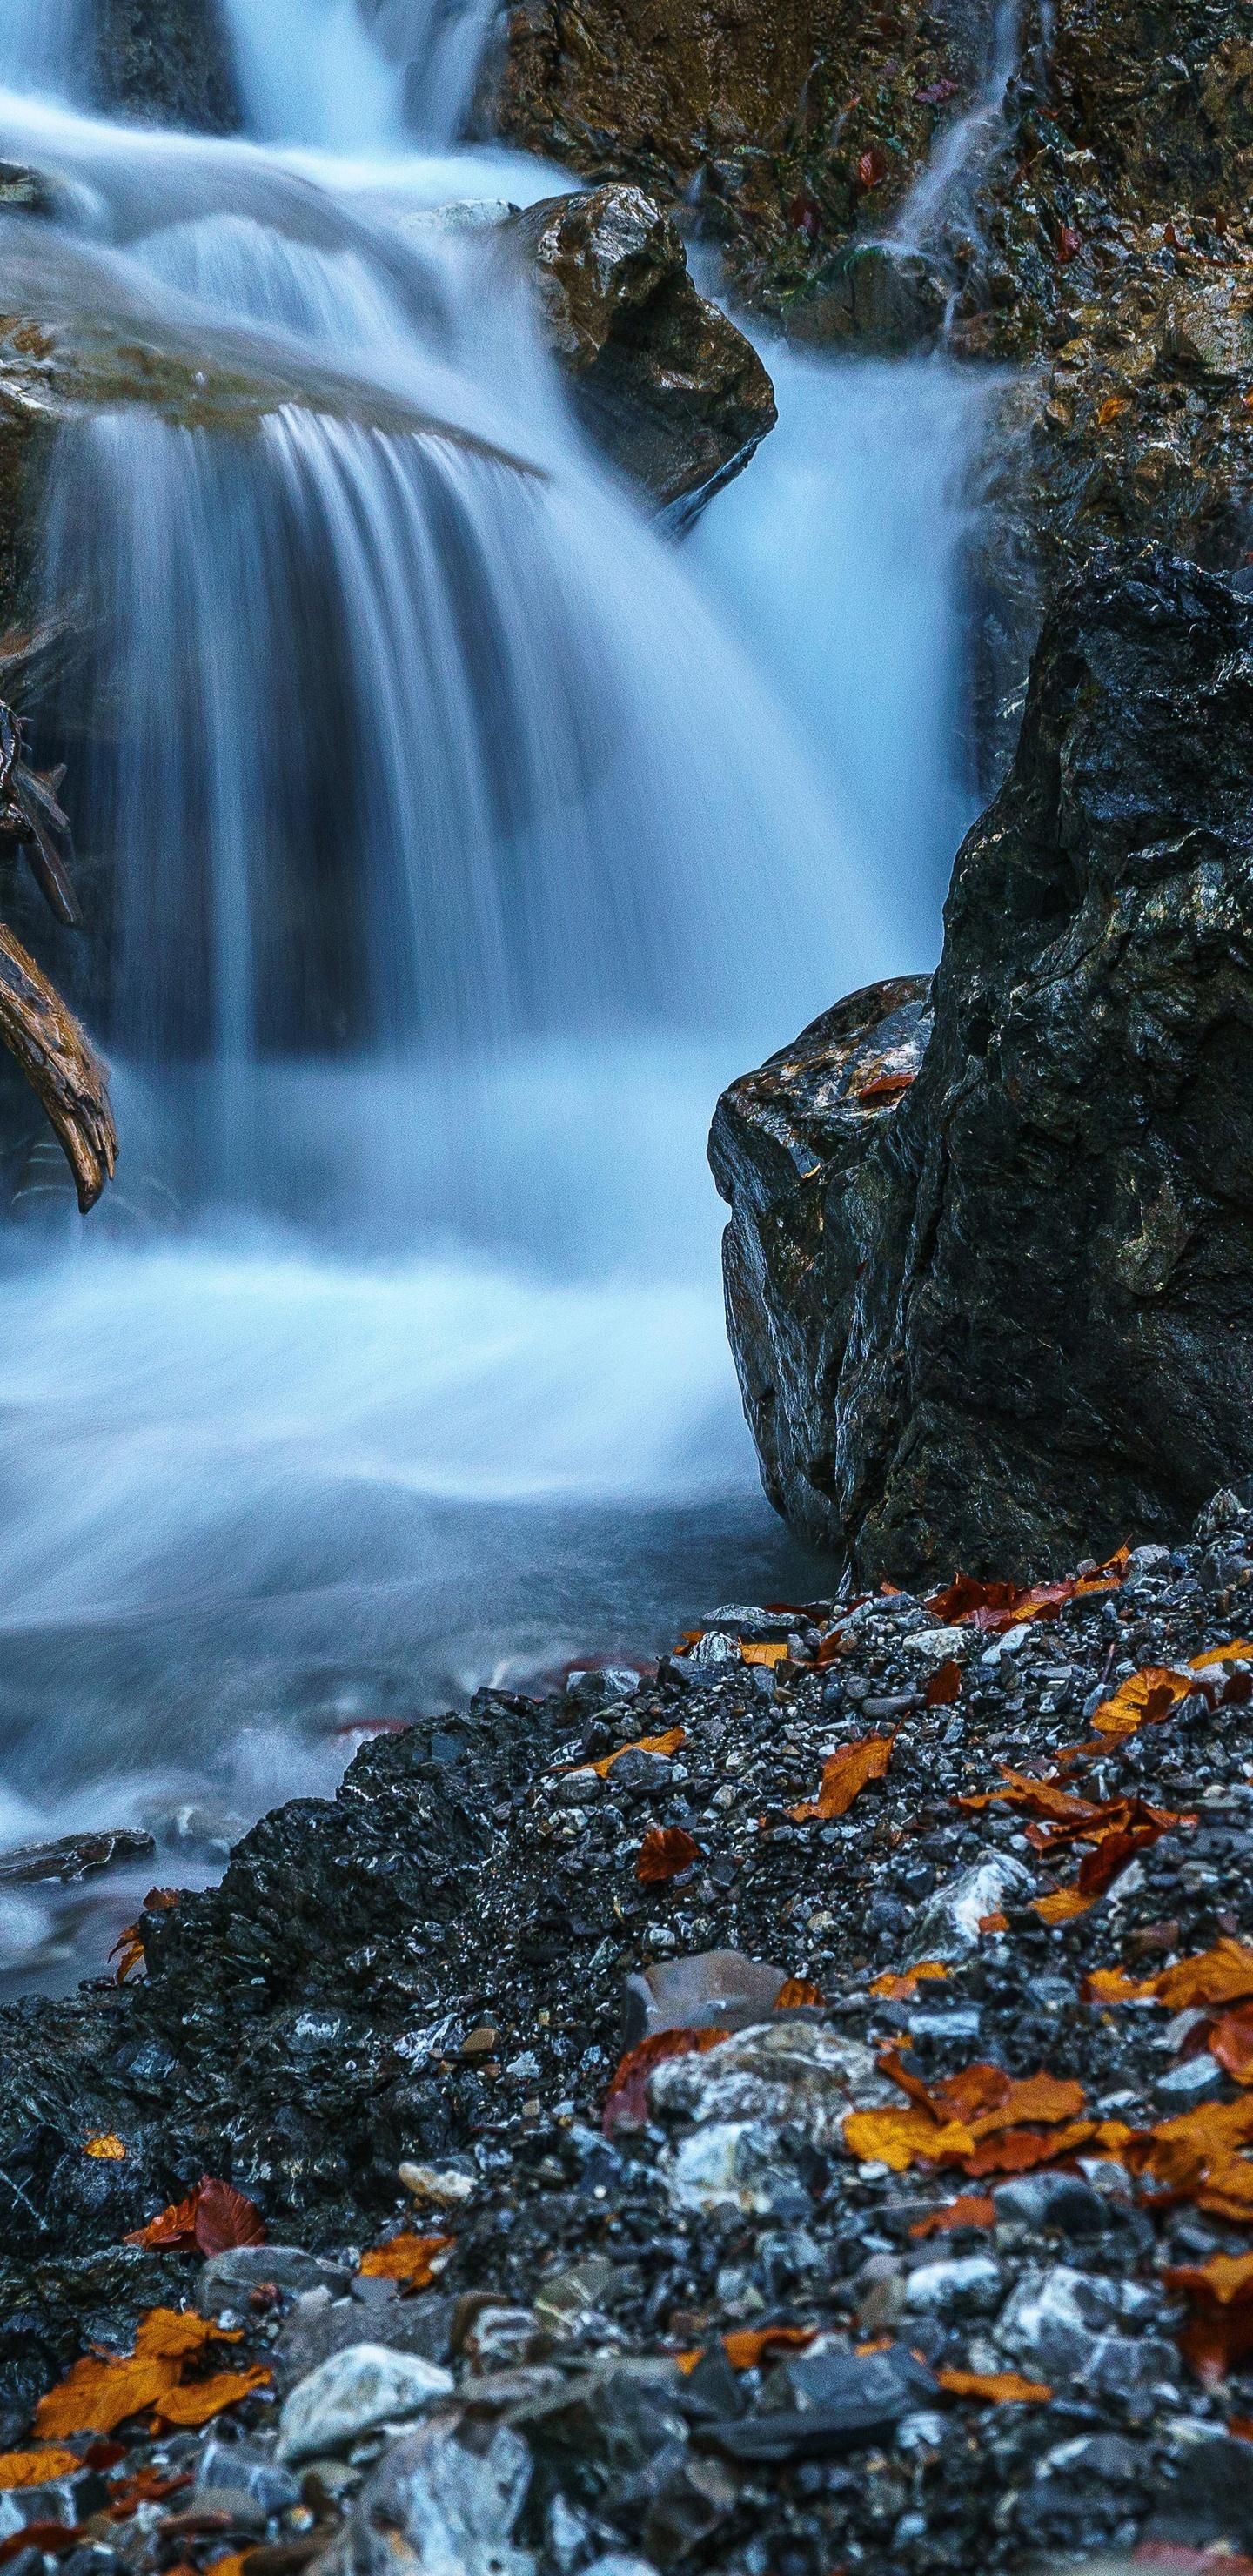 1440x2960 Waterfall Forest Ultra Hd 5k Samsung Galaxy Note 9 8 S9